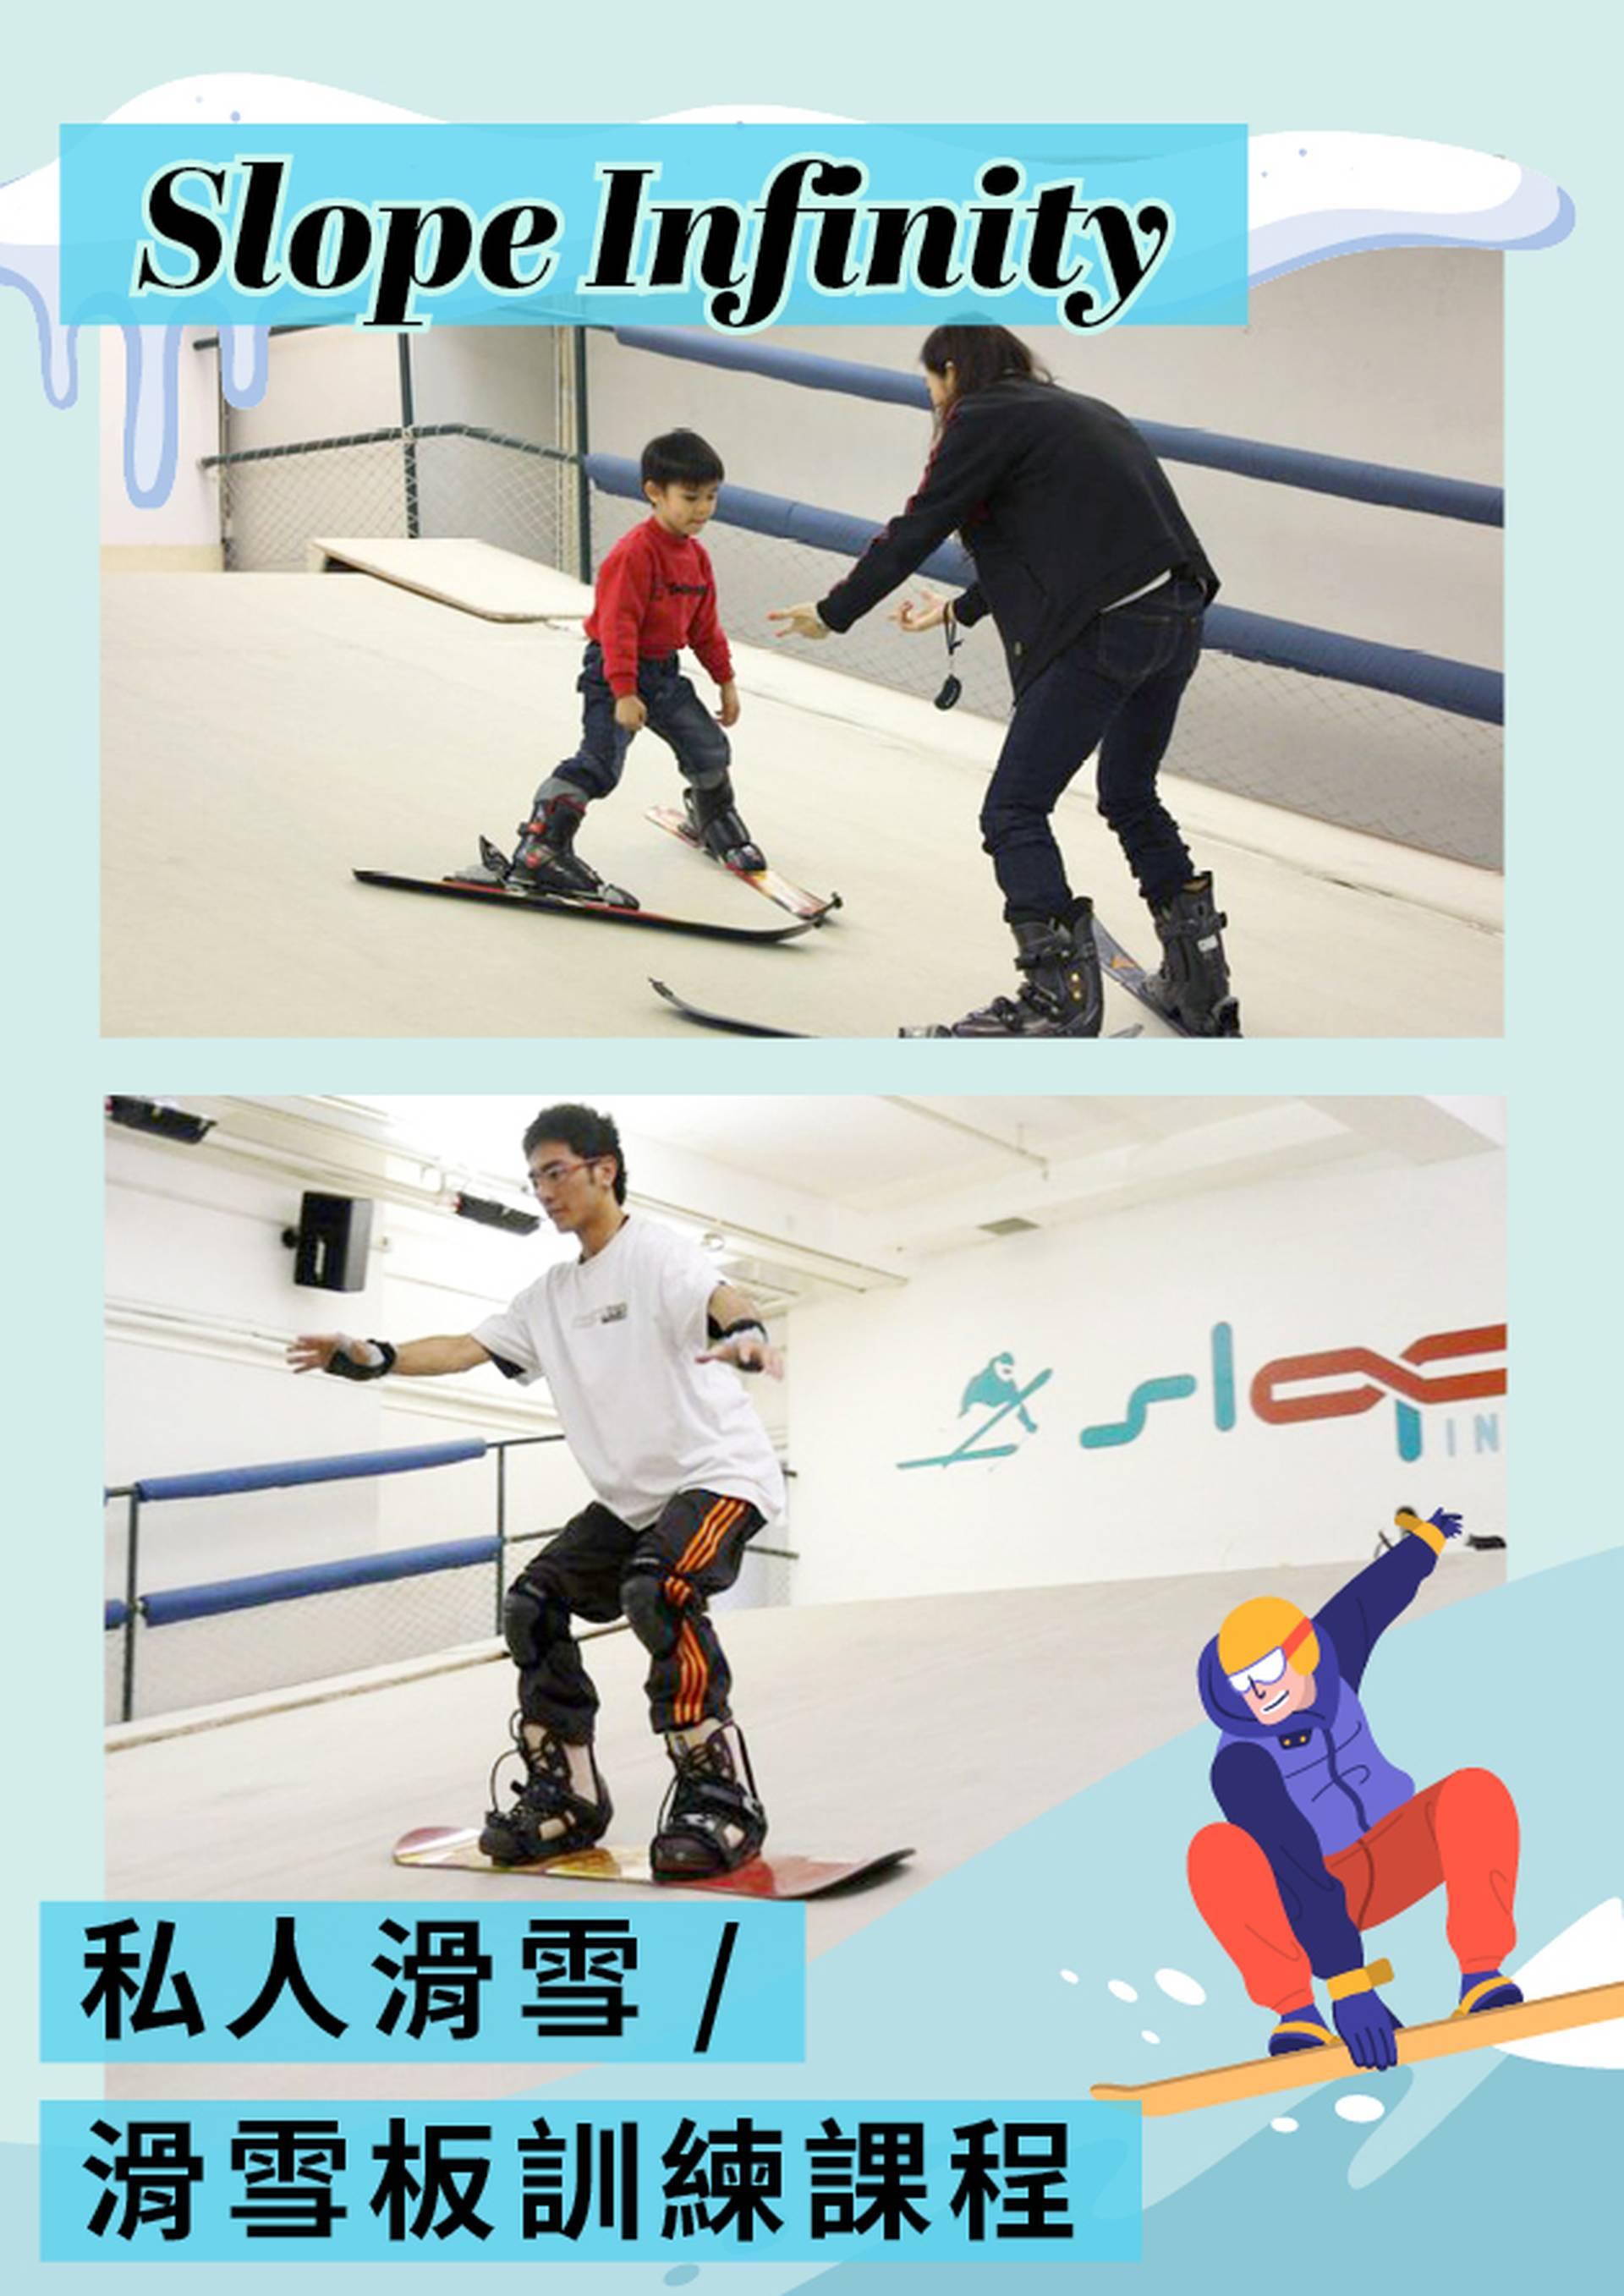 Slope Infinity 夏日私人滑雪/滑雪板訓練課程(需預約)